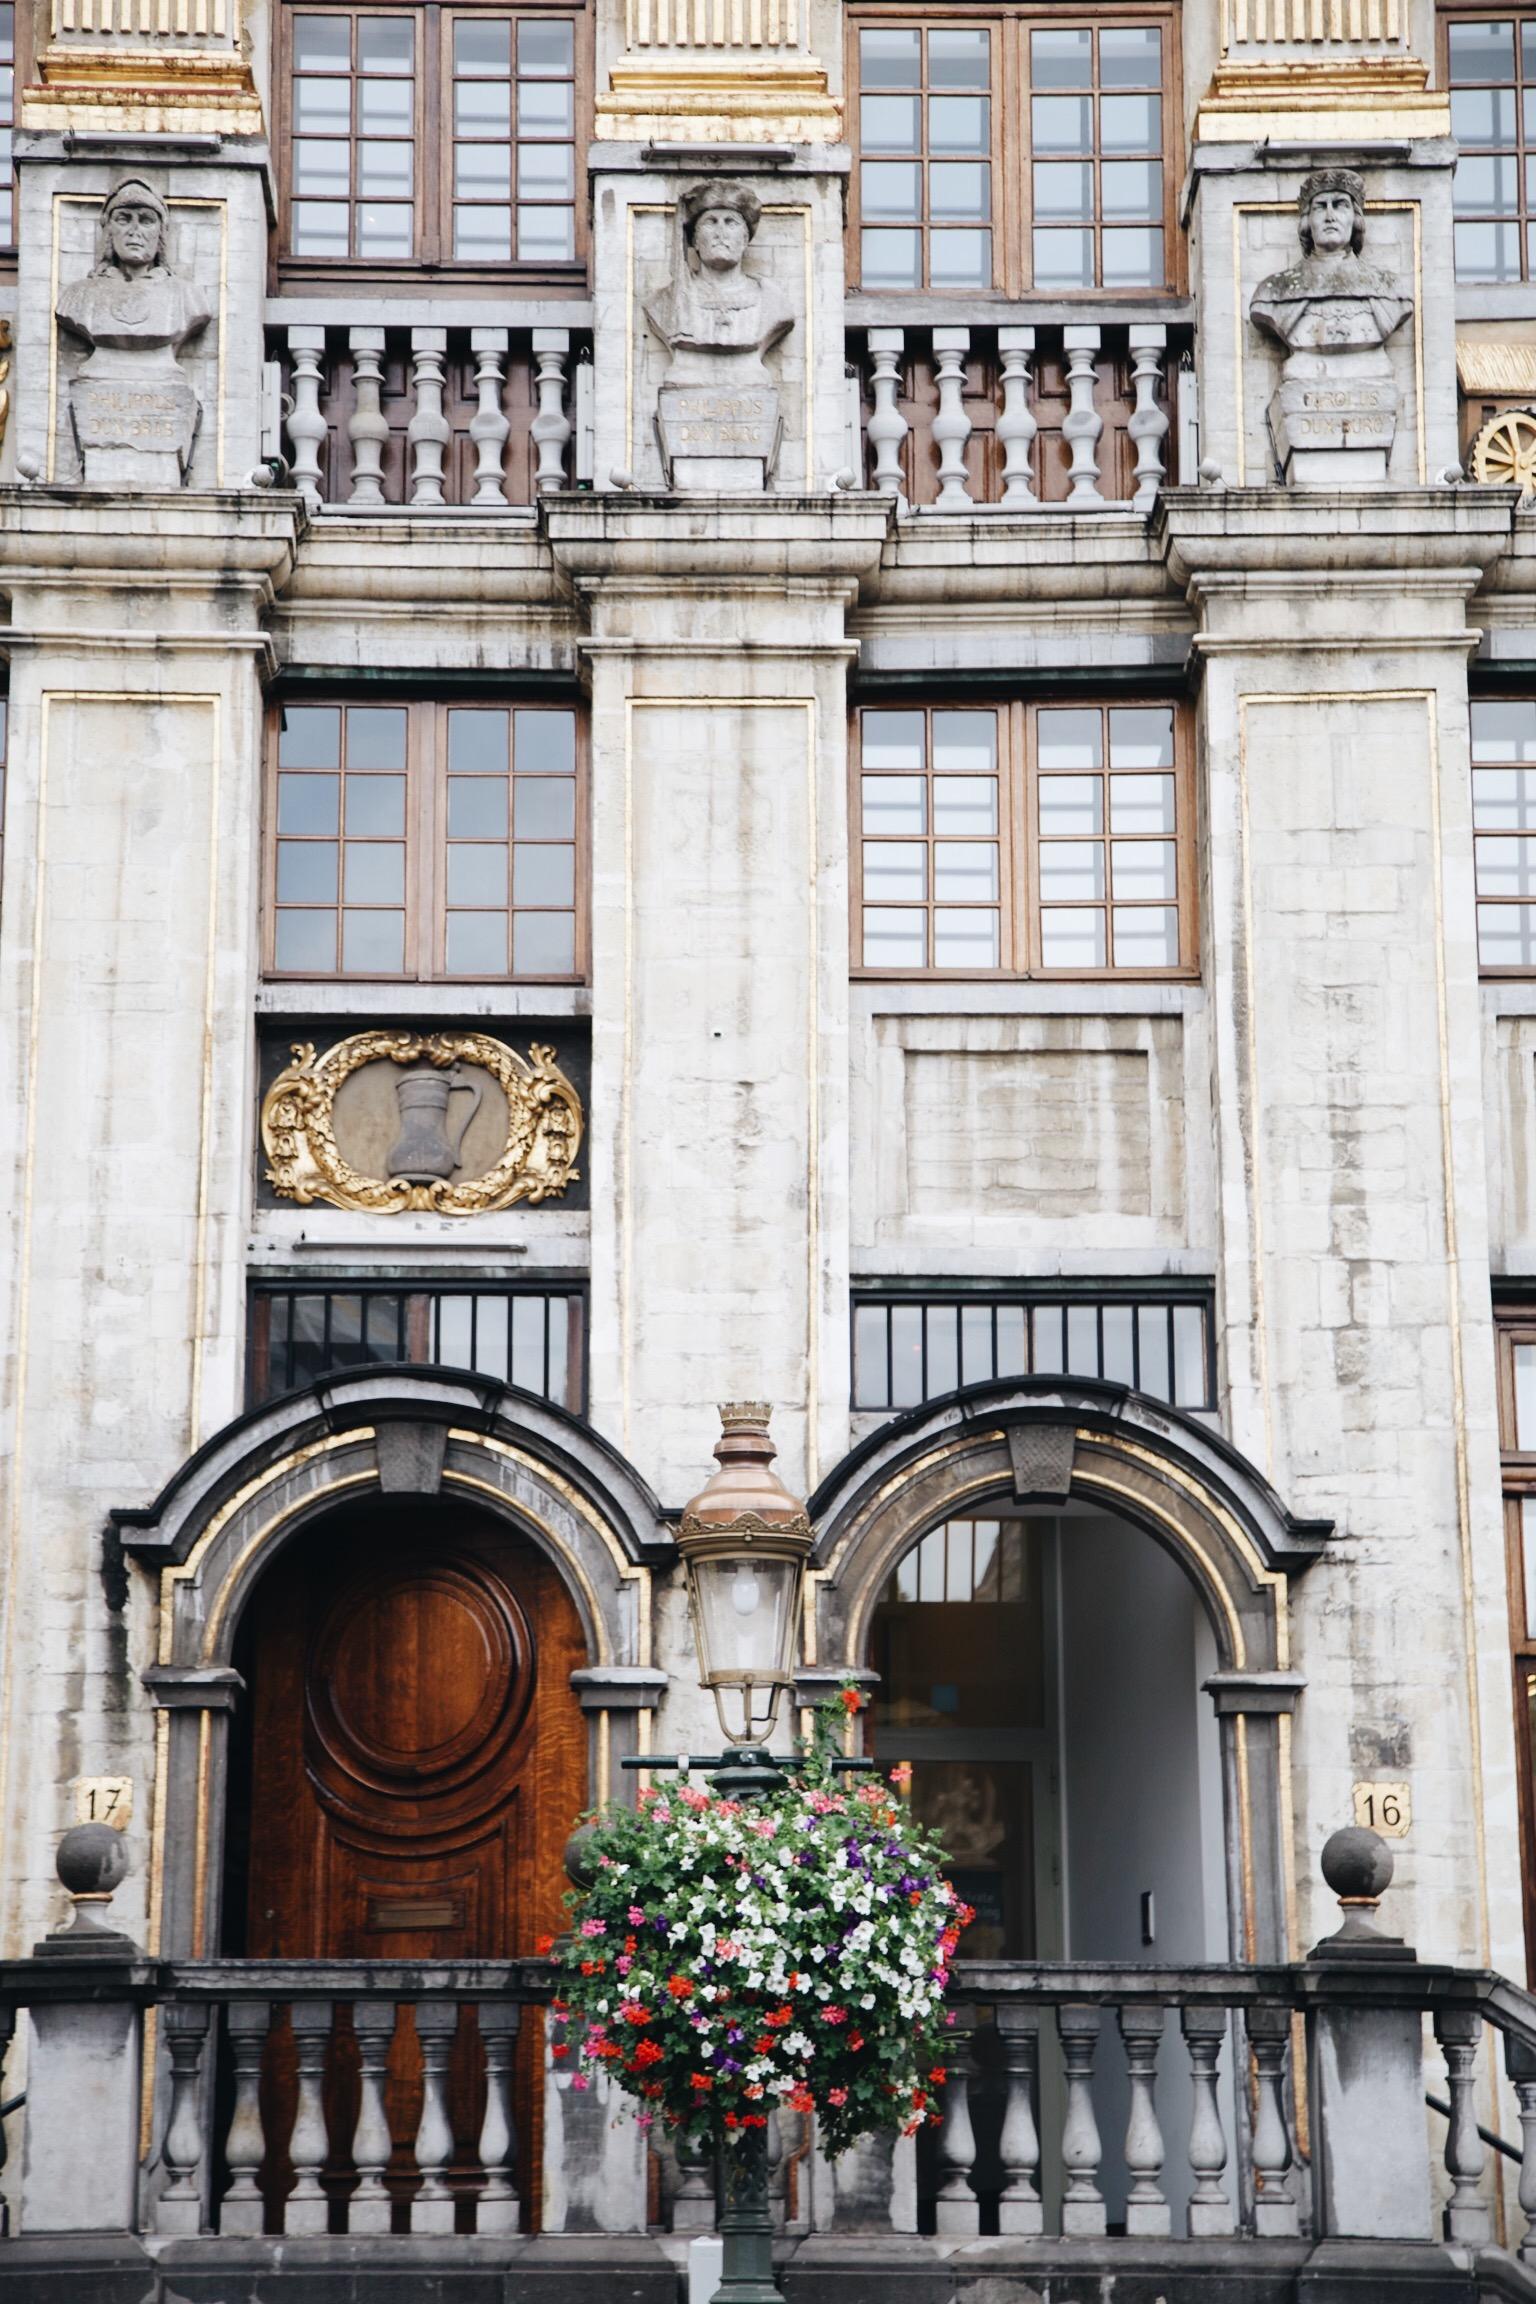 bruxelles-gdplace-architecture.JPG